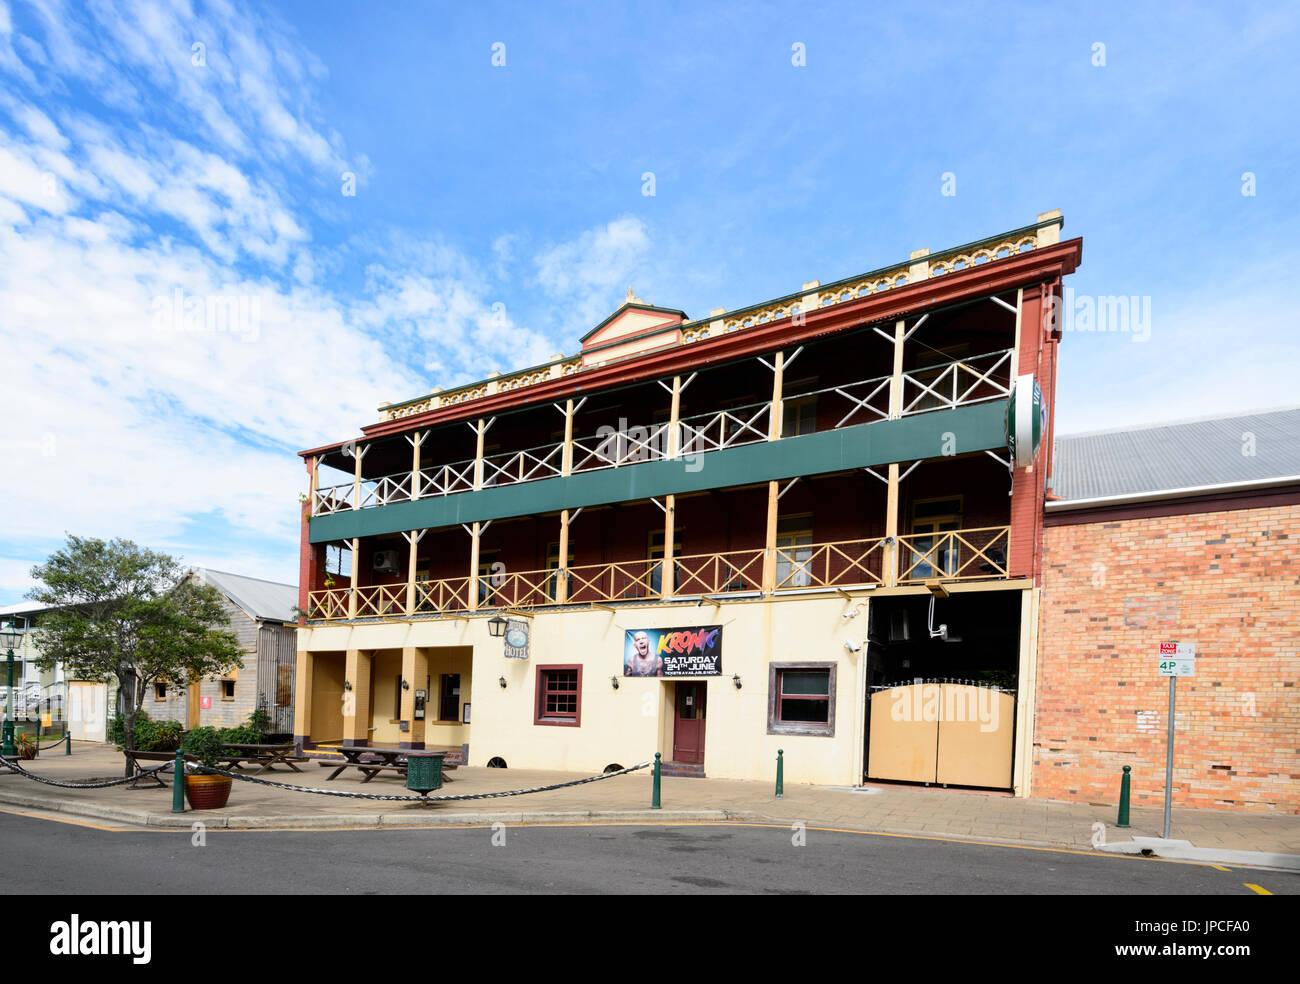 Historic building of the Criterion Hotel in Maryborough Heritage Precinct, Queensland, QLD, Australia - Stock Image